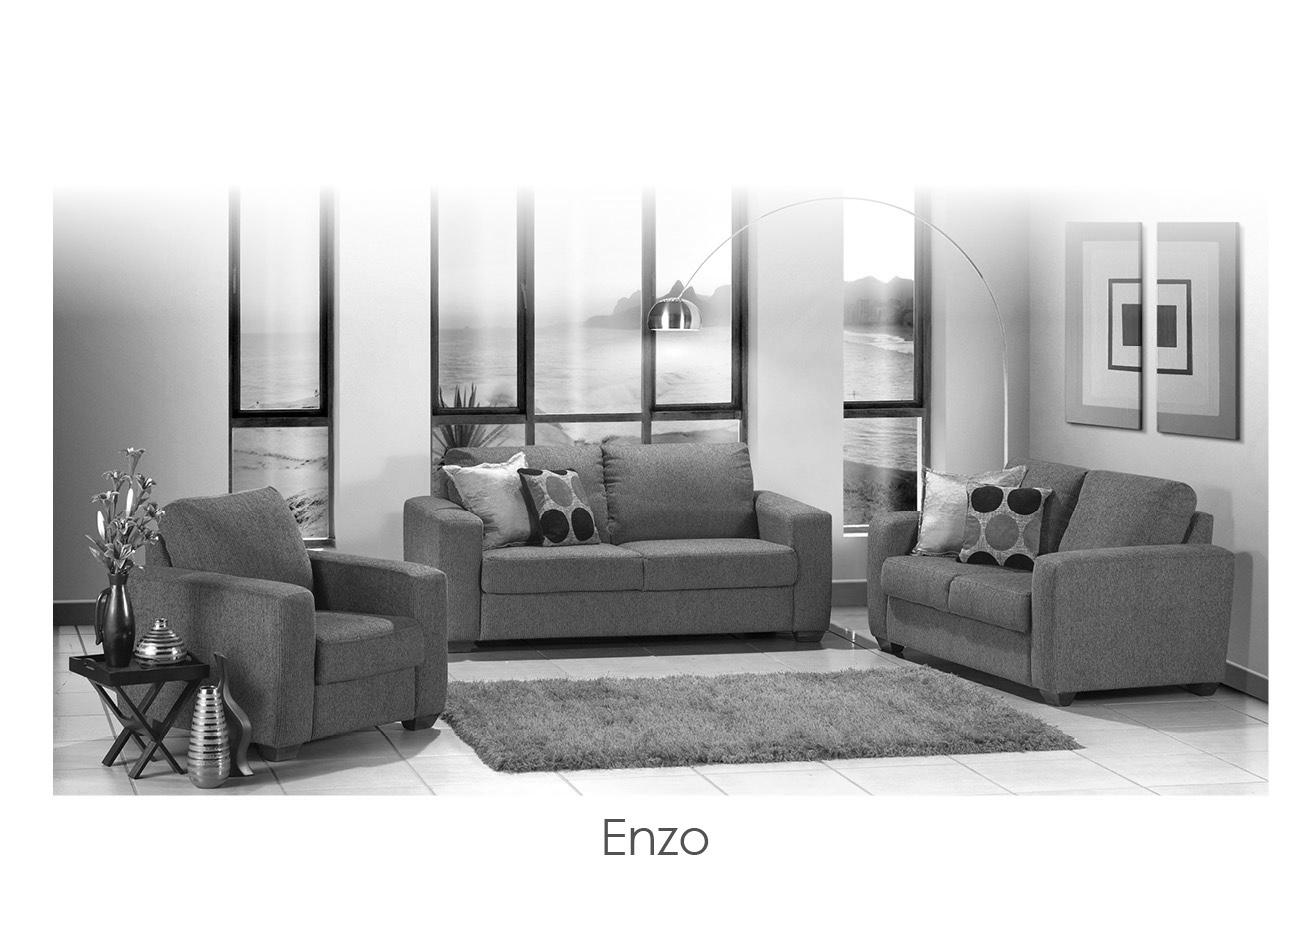 homeconomix online catalogue sofa sets. Black Bedroom Furniture Sets. Home Design Ideas